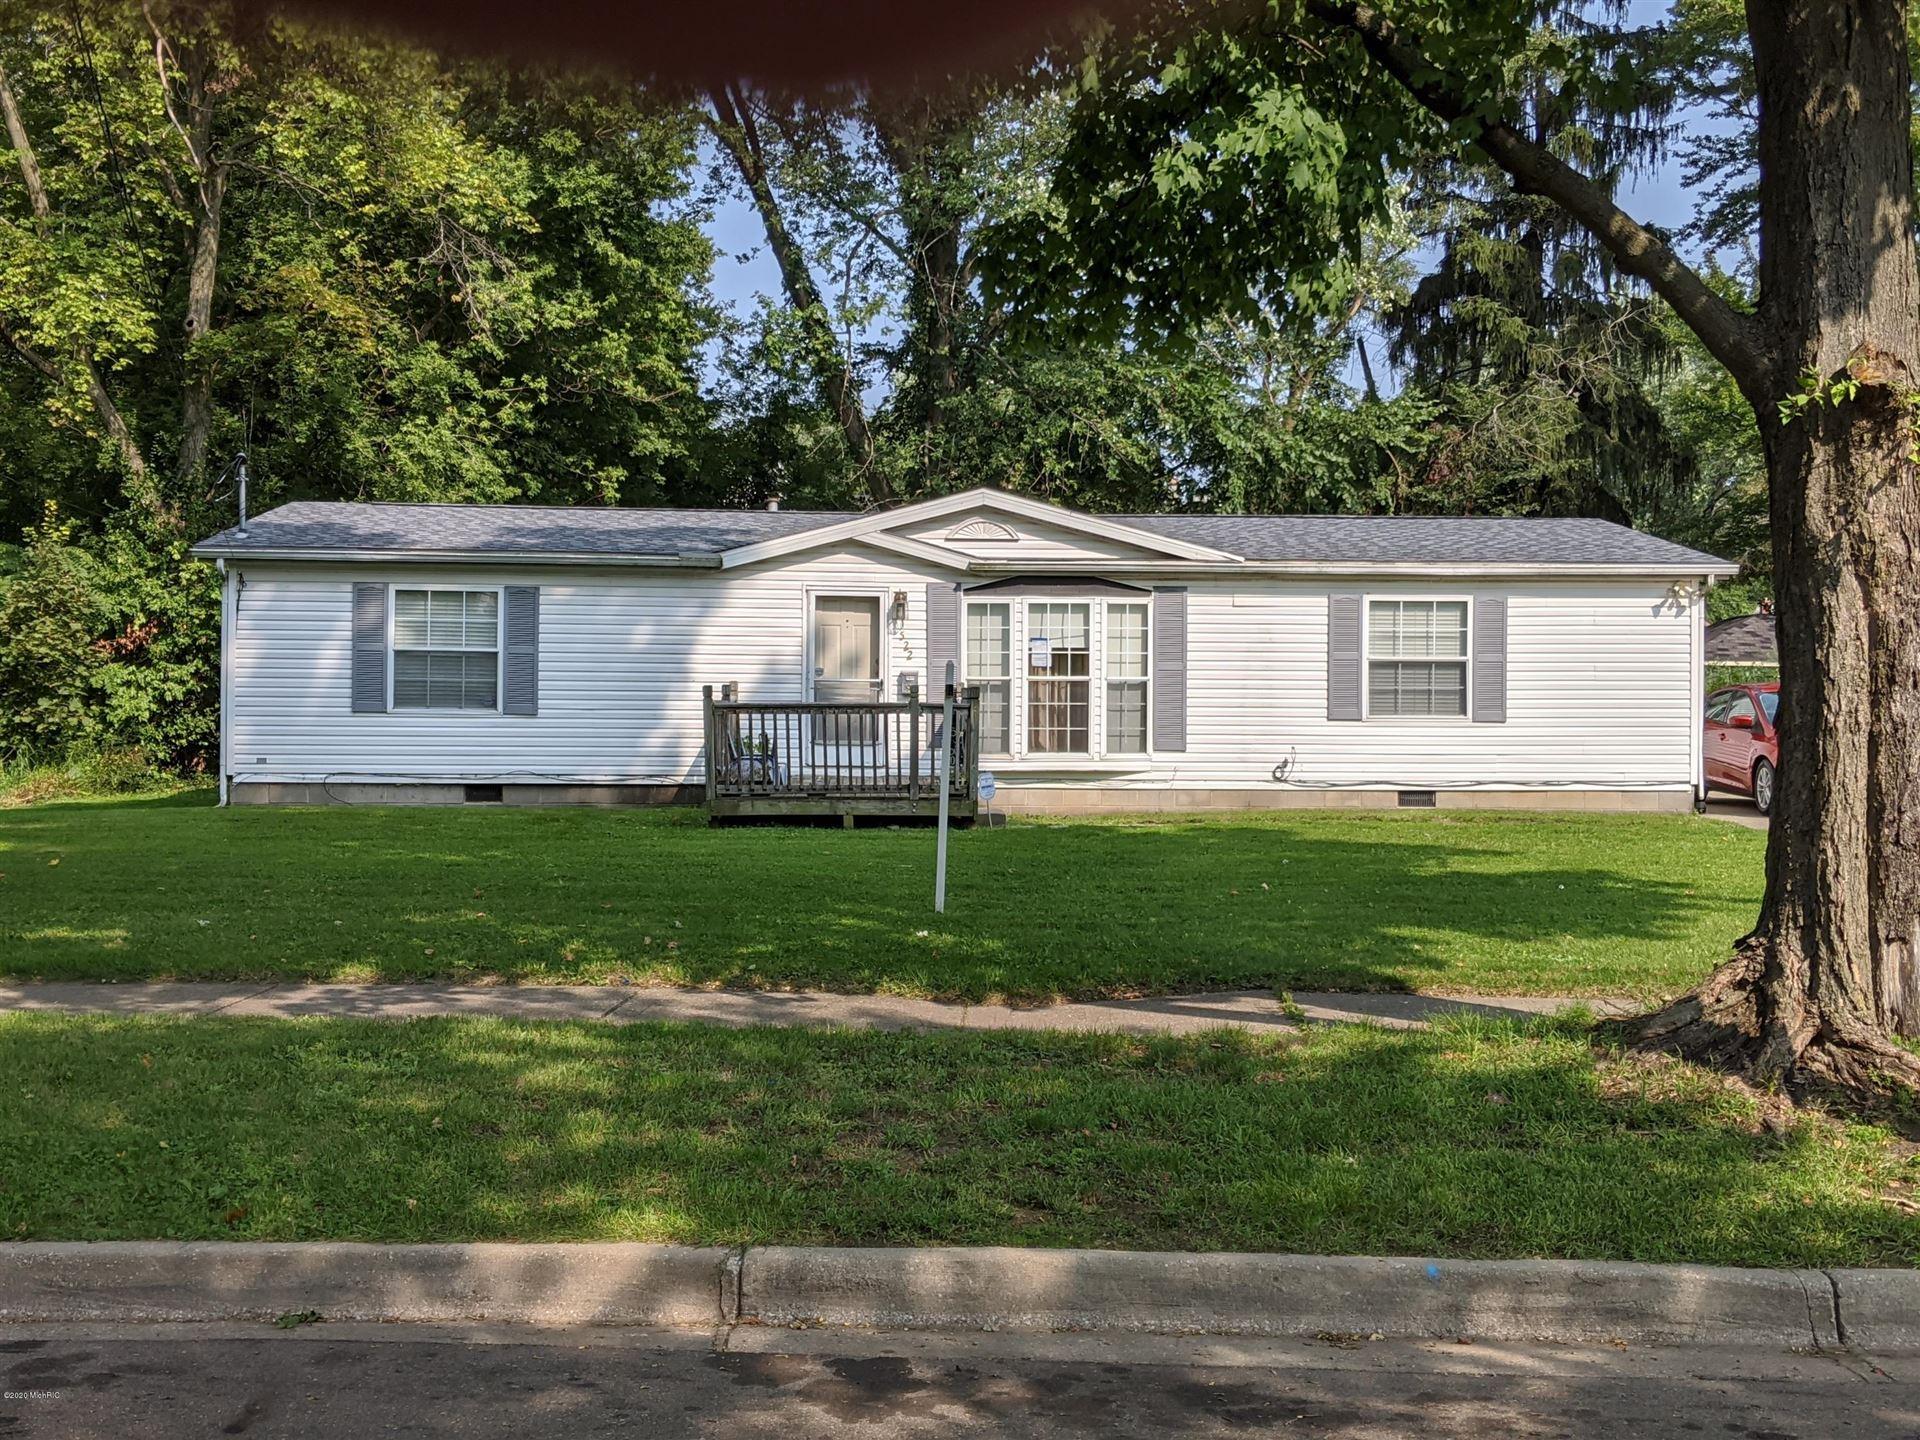 522 William Street, Kalamazoo, MI 49007 - MLS#: 20038665